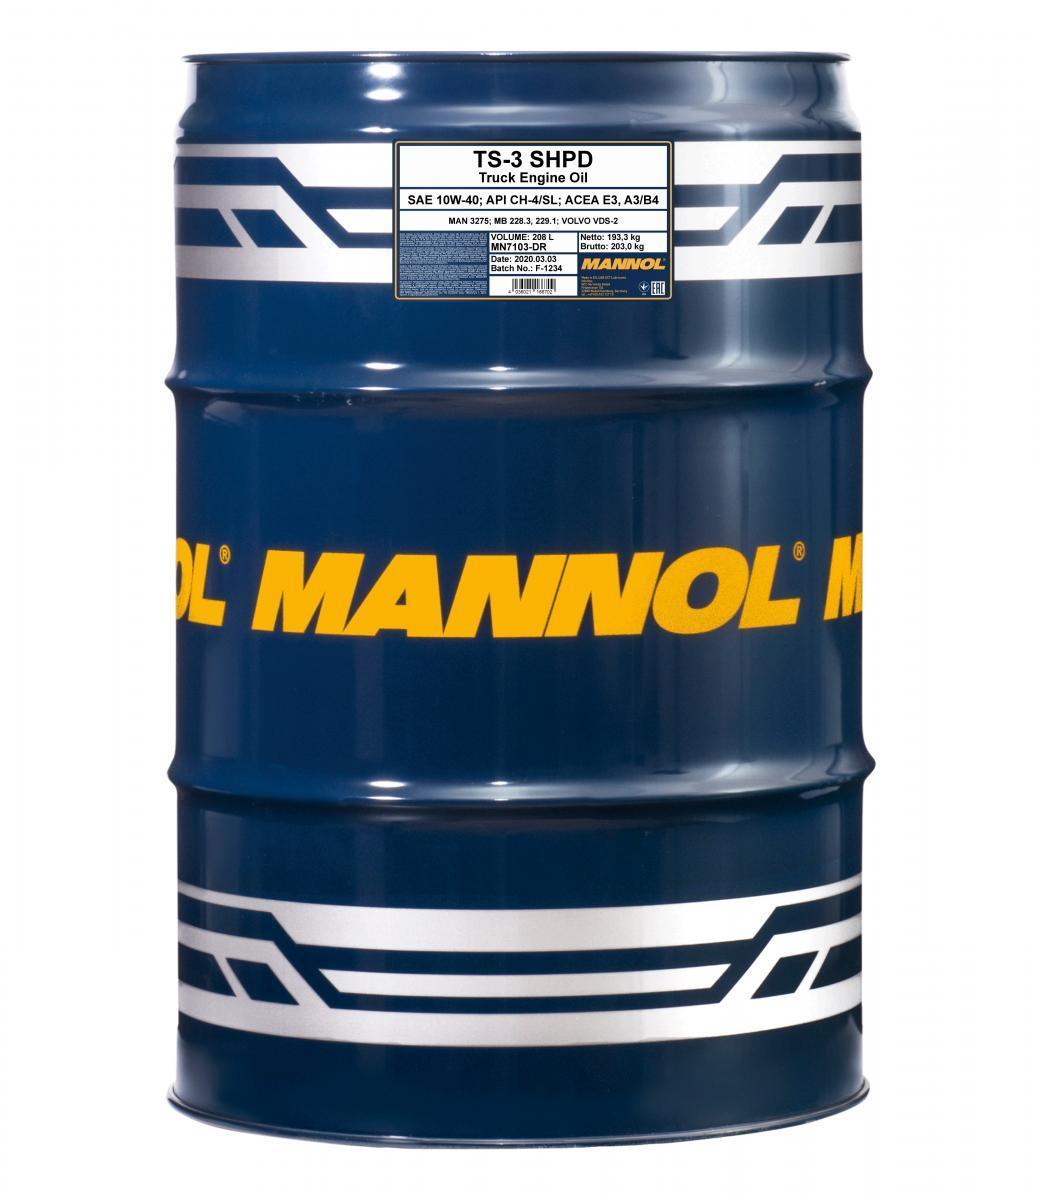 MN7103-DR MANNOL TS-3, SHPD 10W-40, 208l Motoröl MN7103-DR günstig kaufen